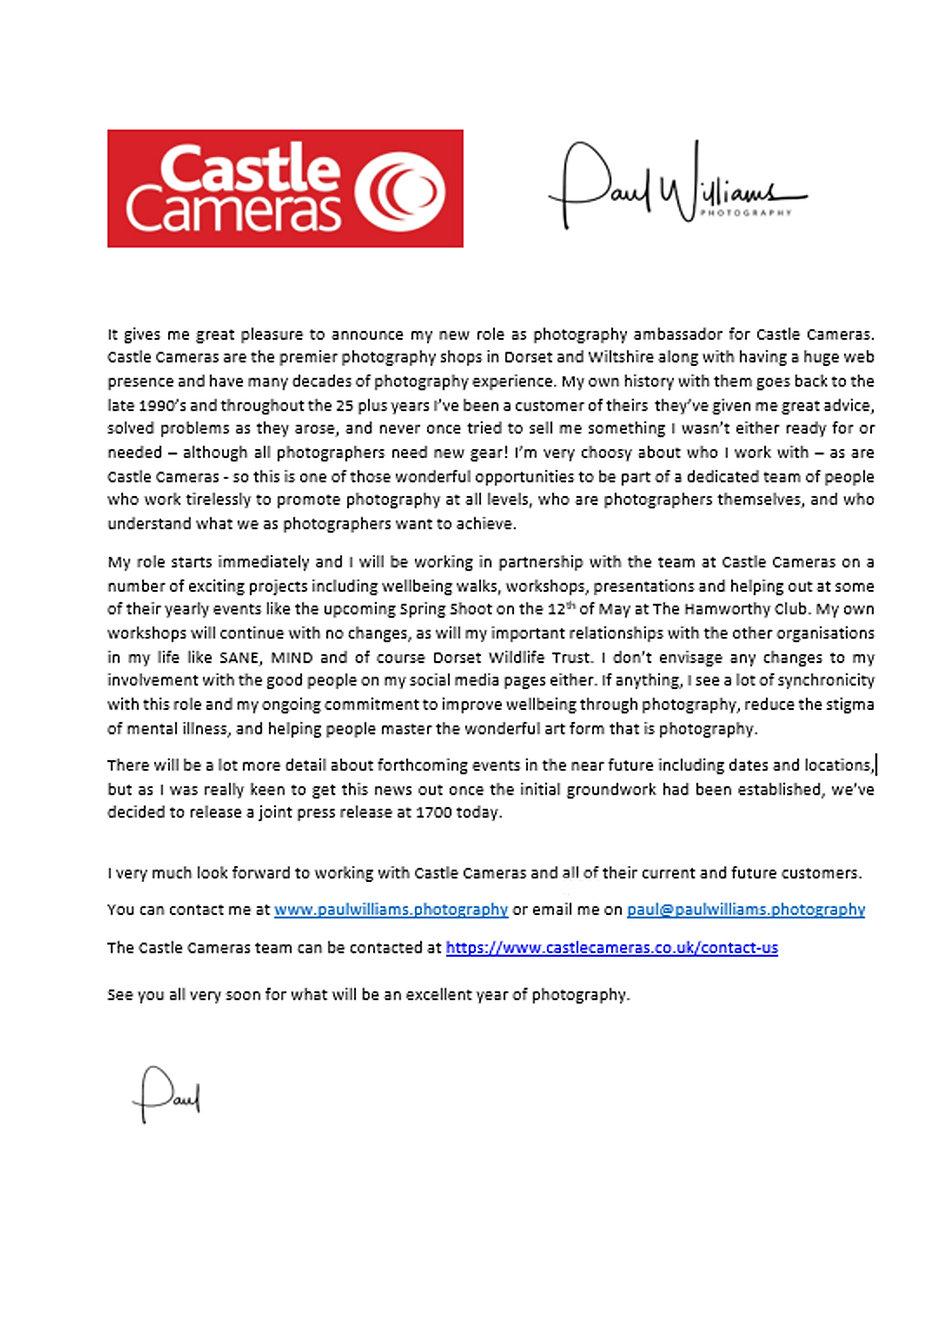 castle cameras press release.jpg